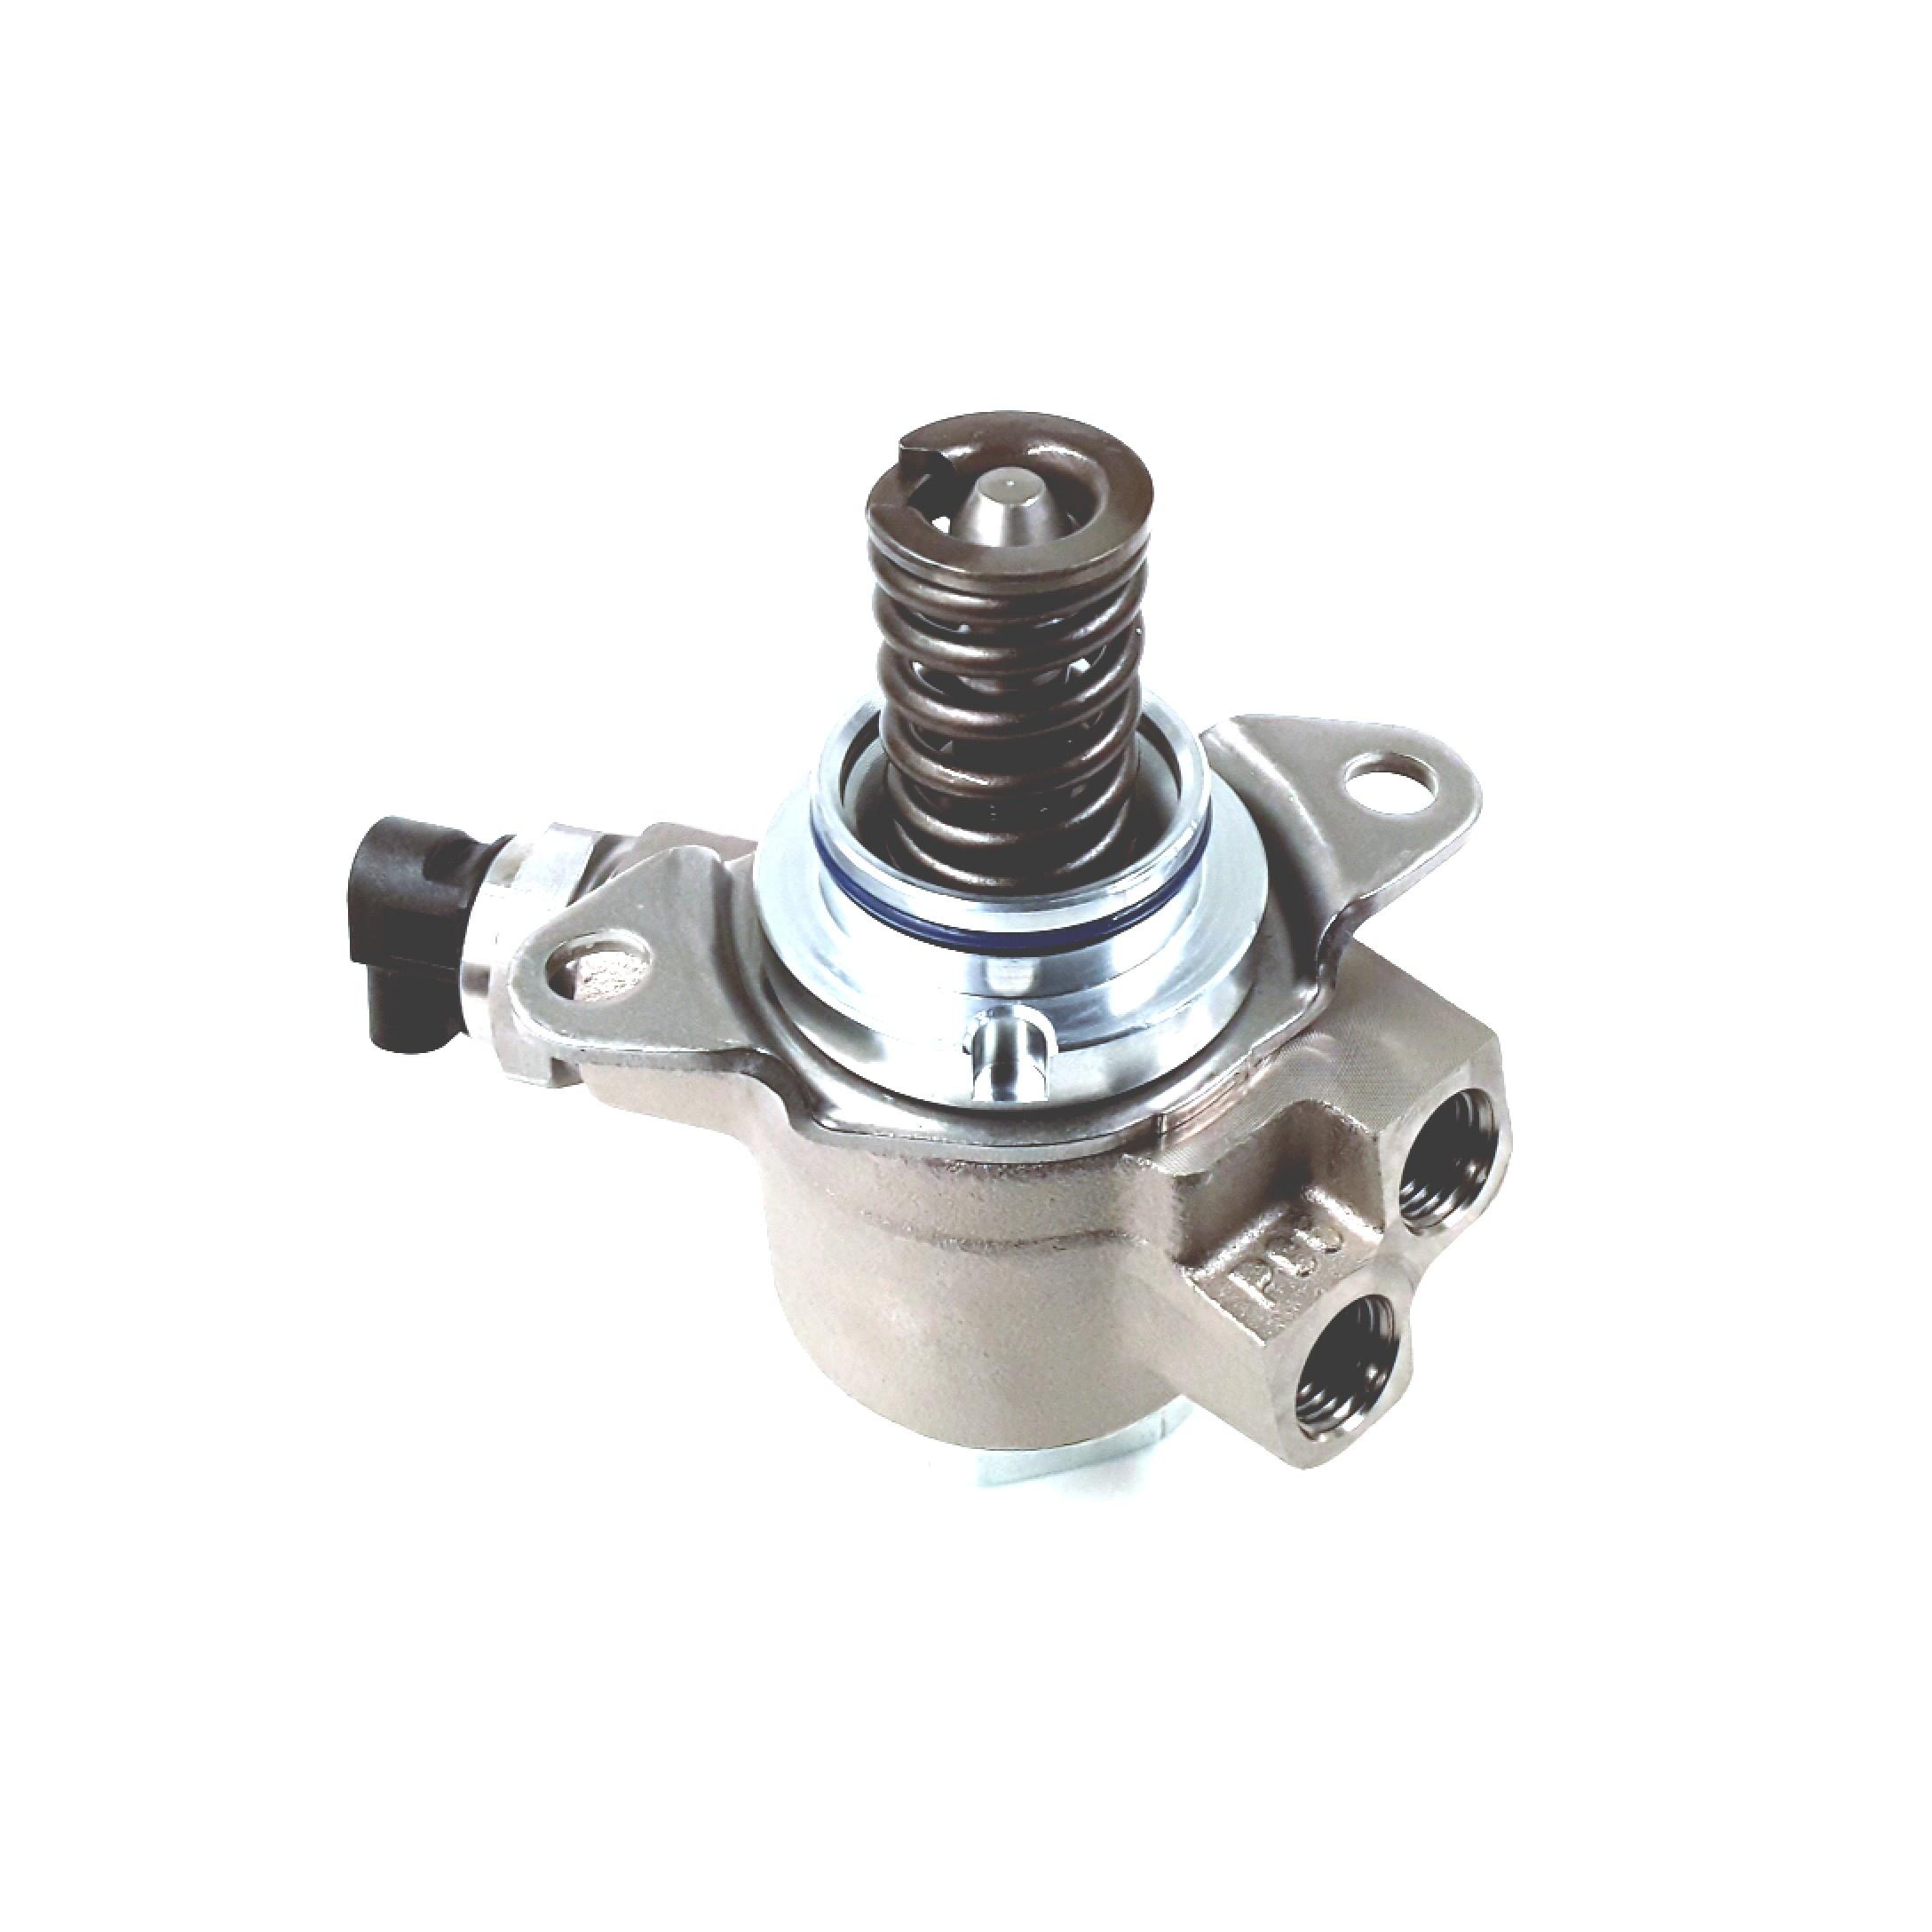 Fuel Pump For 2011 Audi A6 Audi Of America Inc